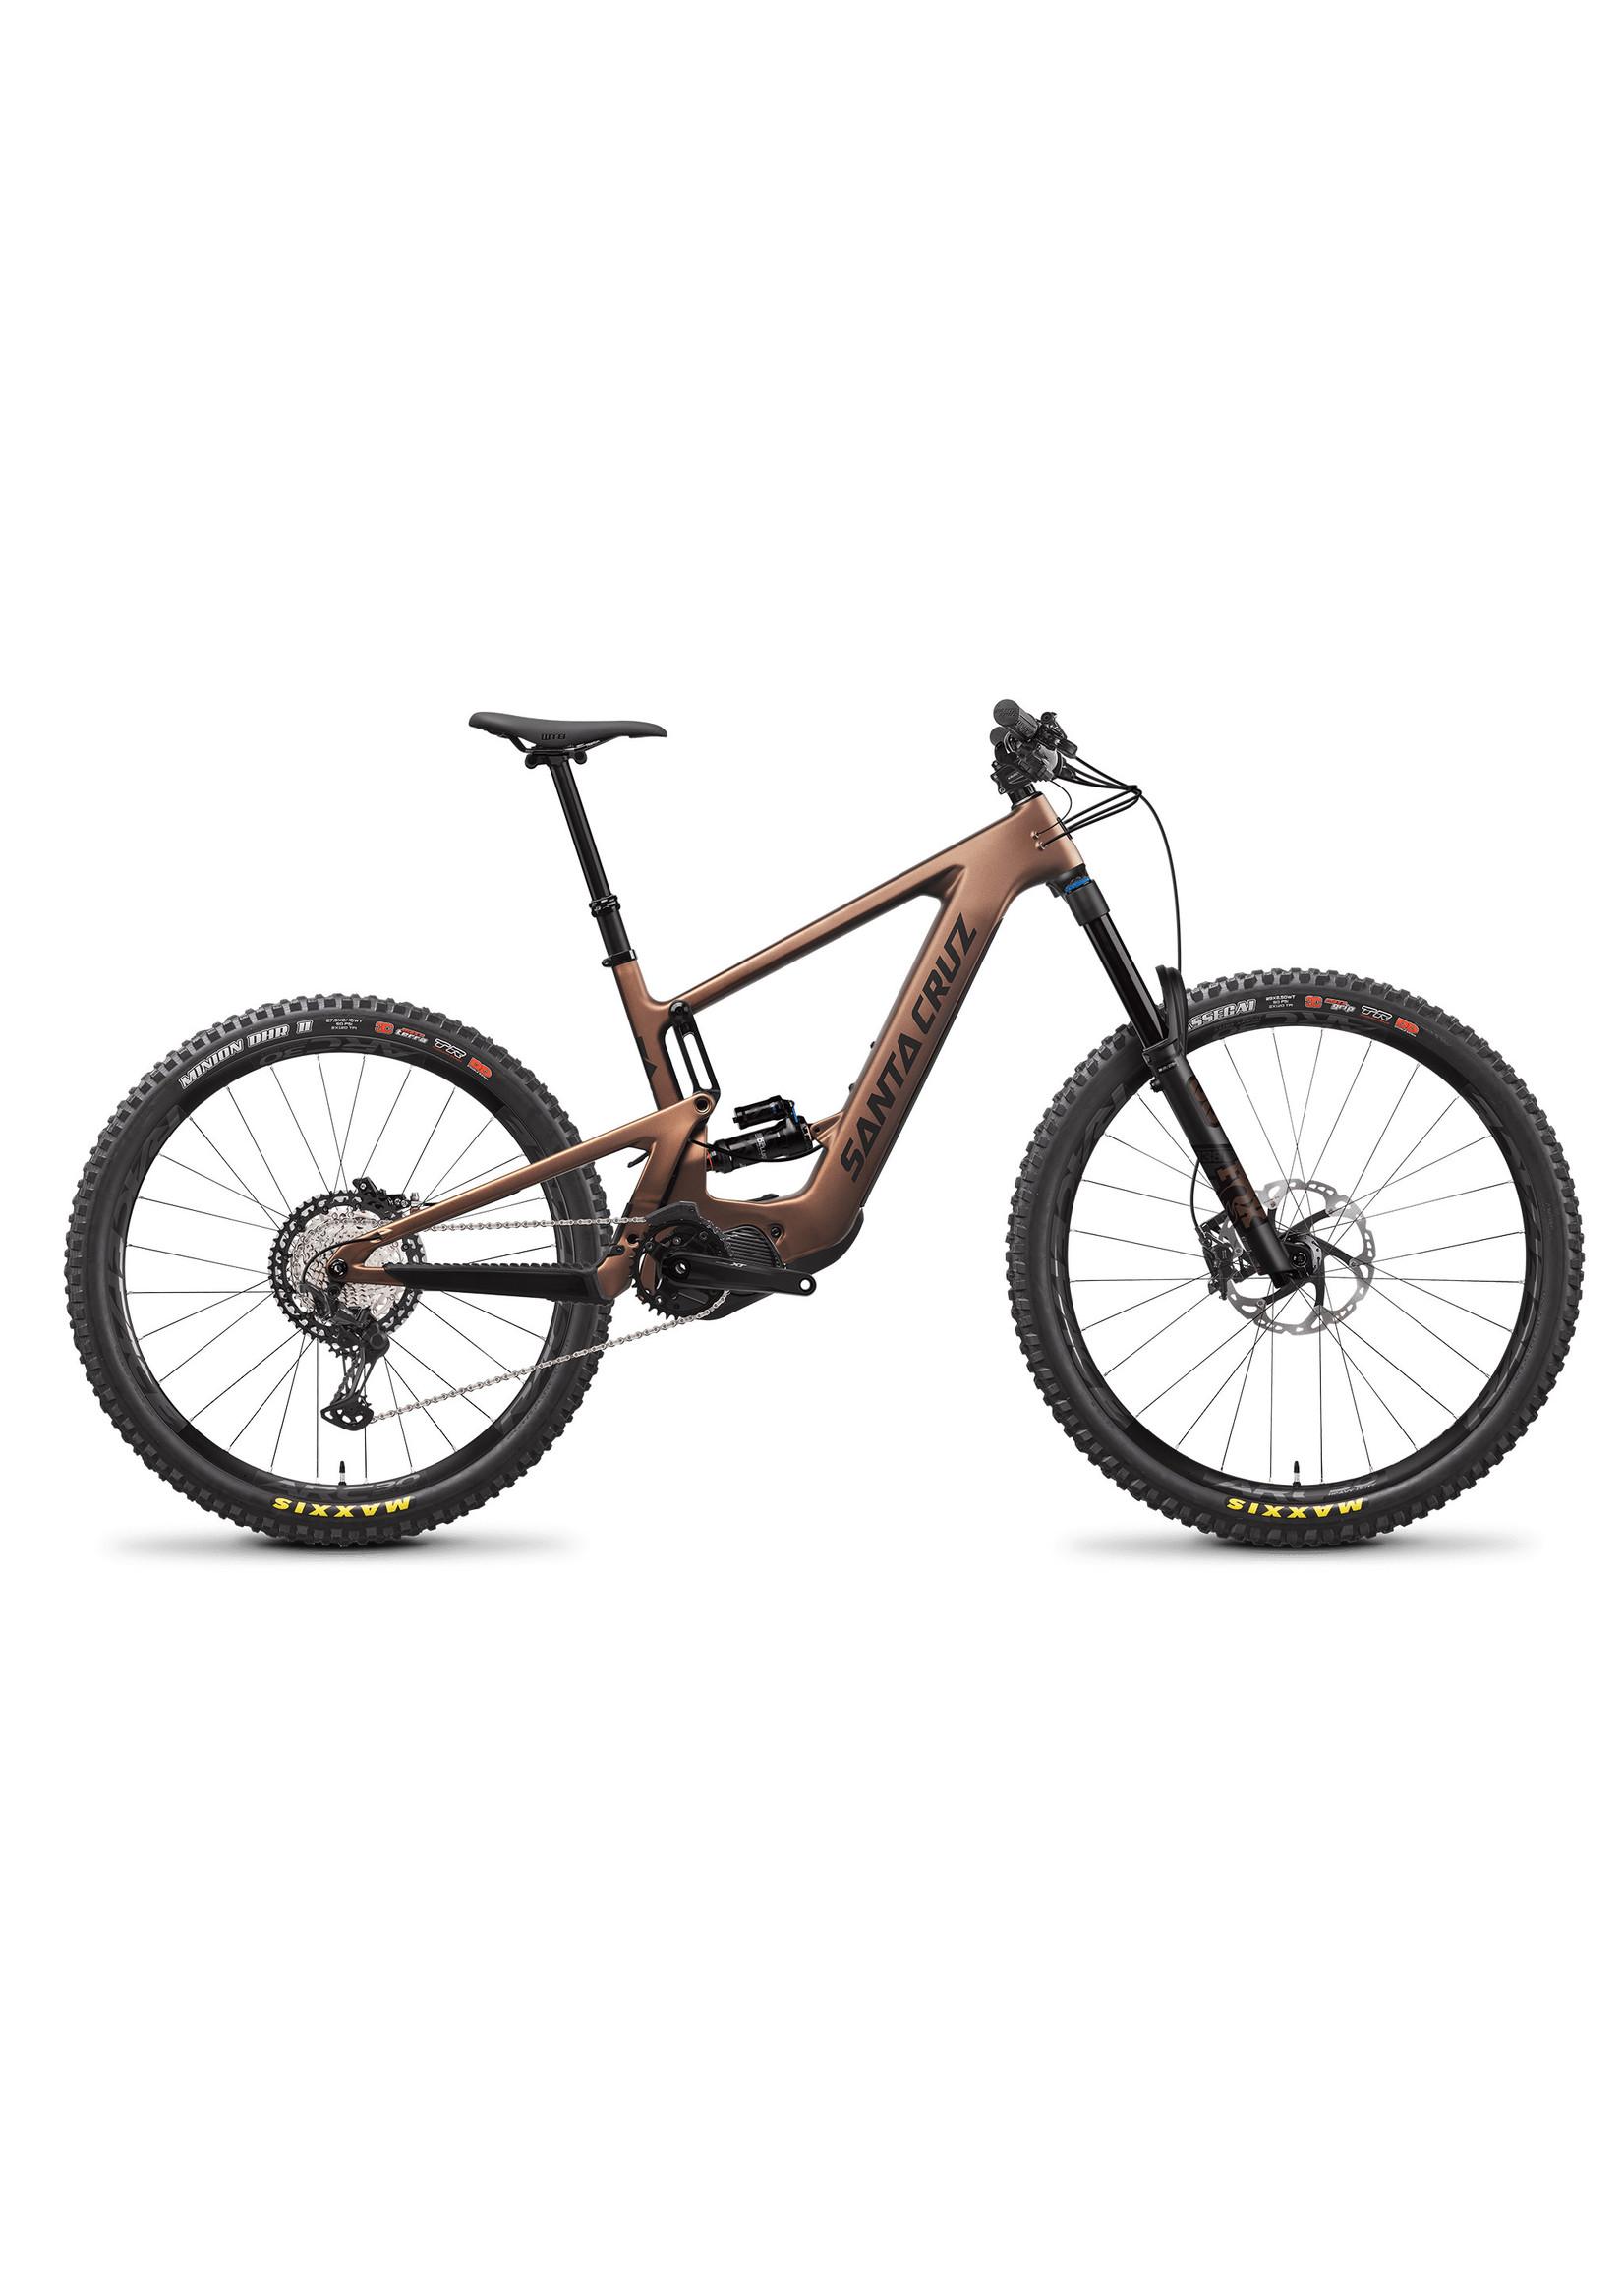 Santa Cruz Bicycles 2021 Santa Cruz Bullit CC, XT